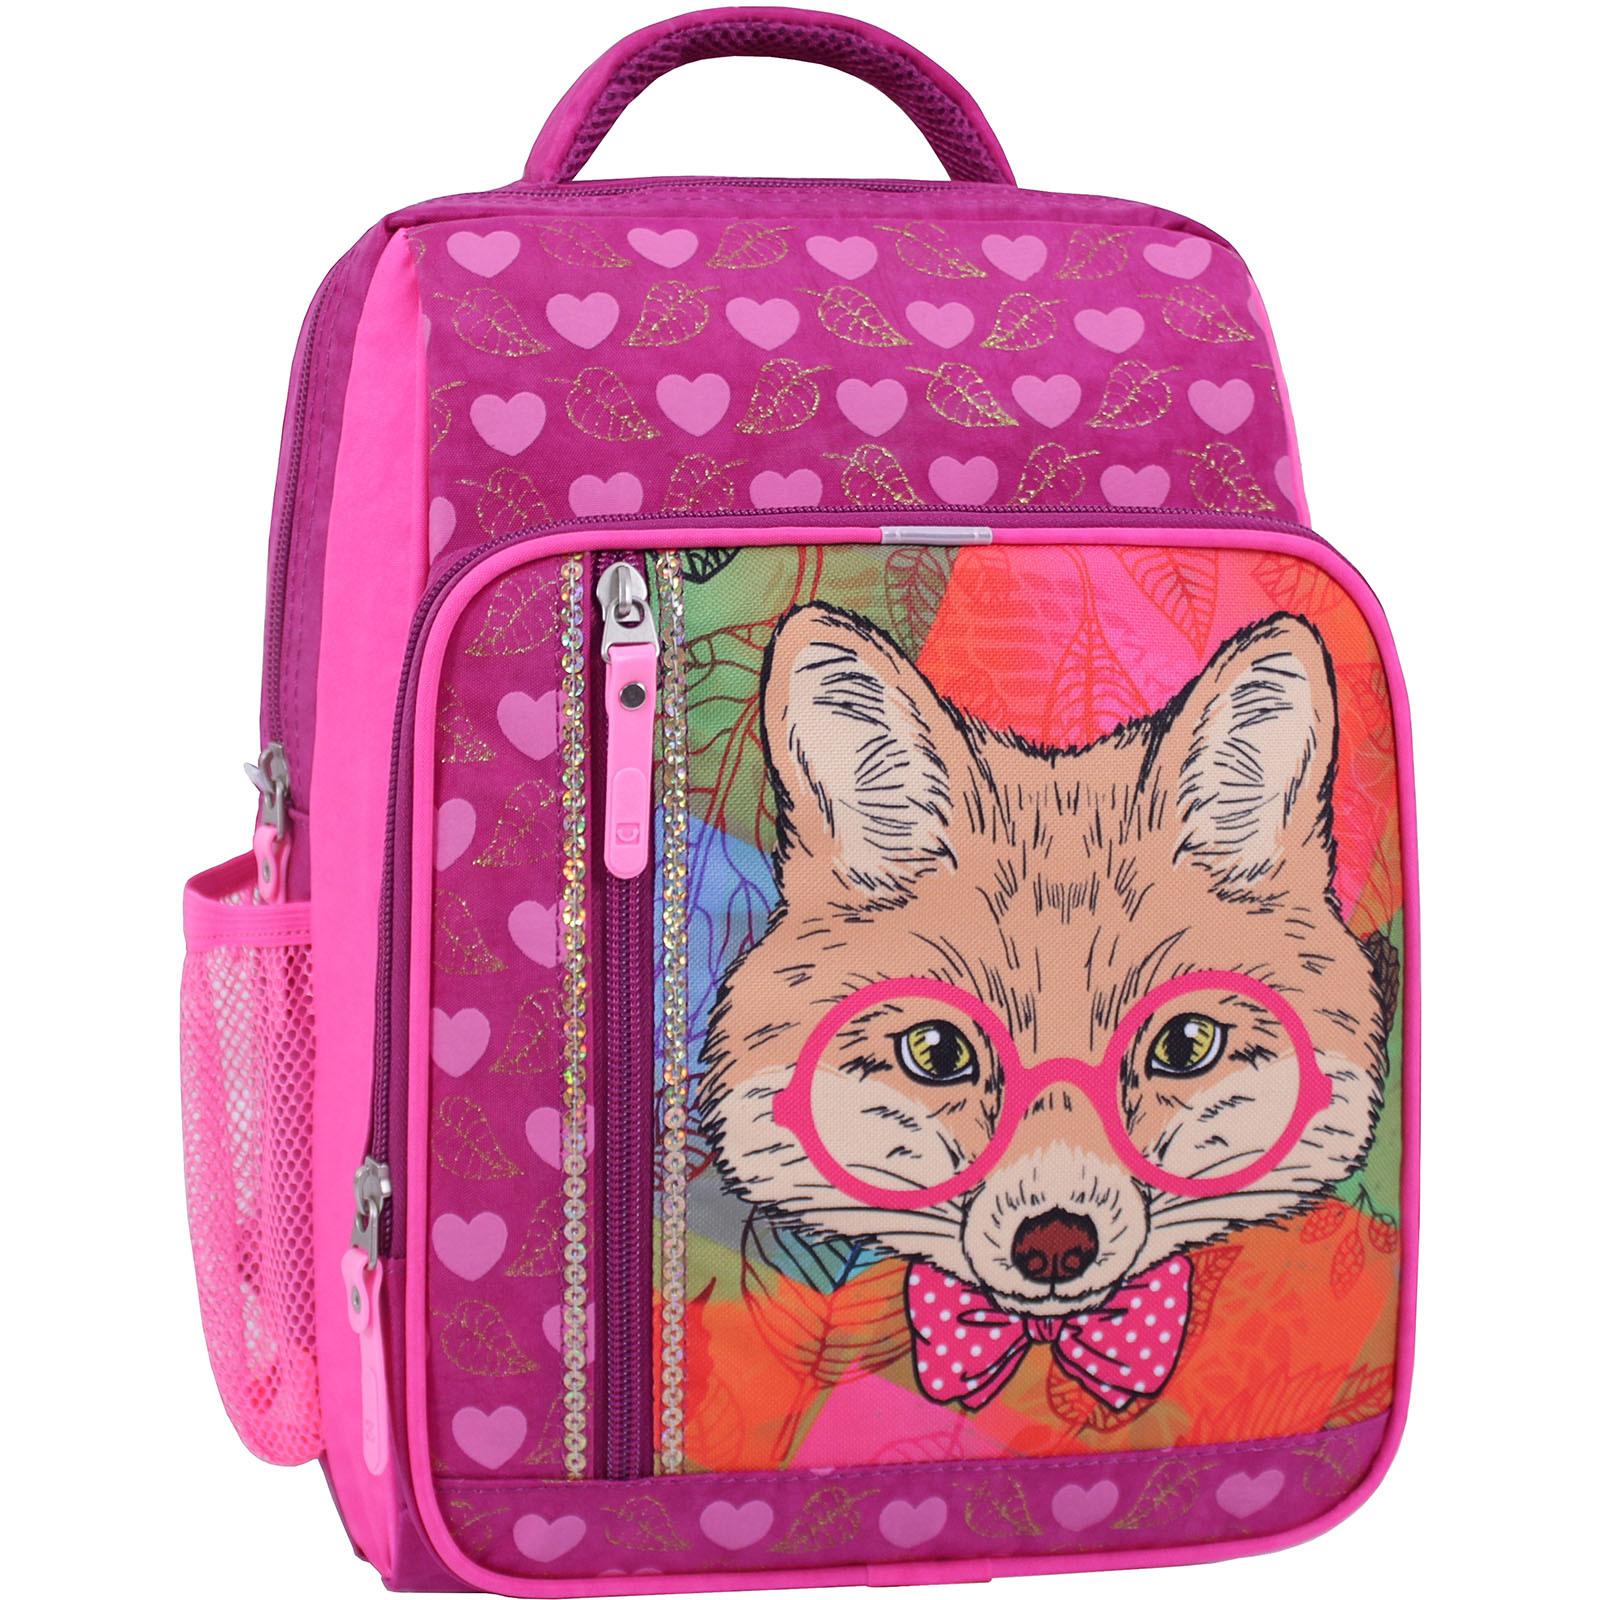 Школьные рюкзаки Рюкзак школьный Bagland Школьник 8 л. 143 малиновый 512 (0012870) IMG_0940_суб.512_.JPG